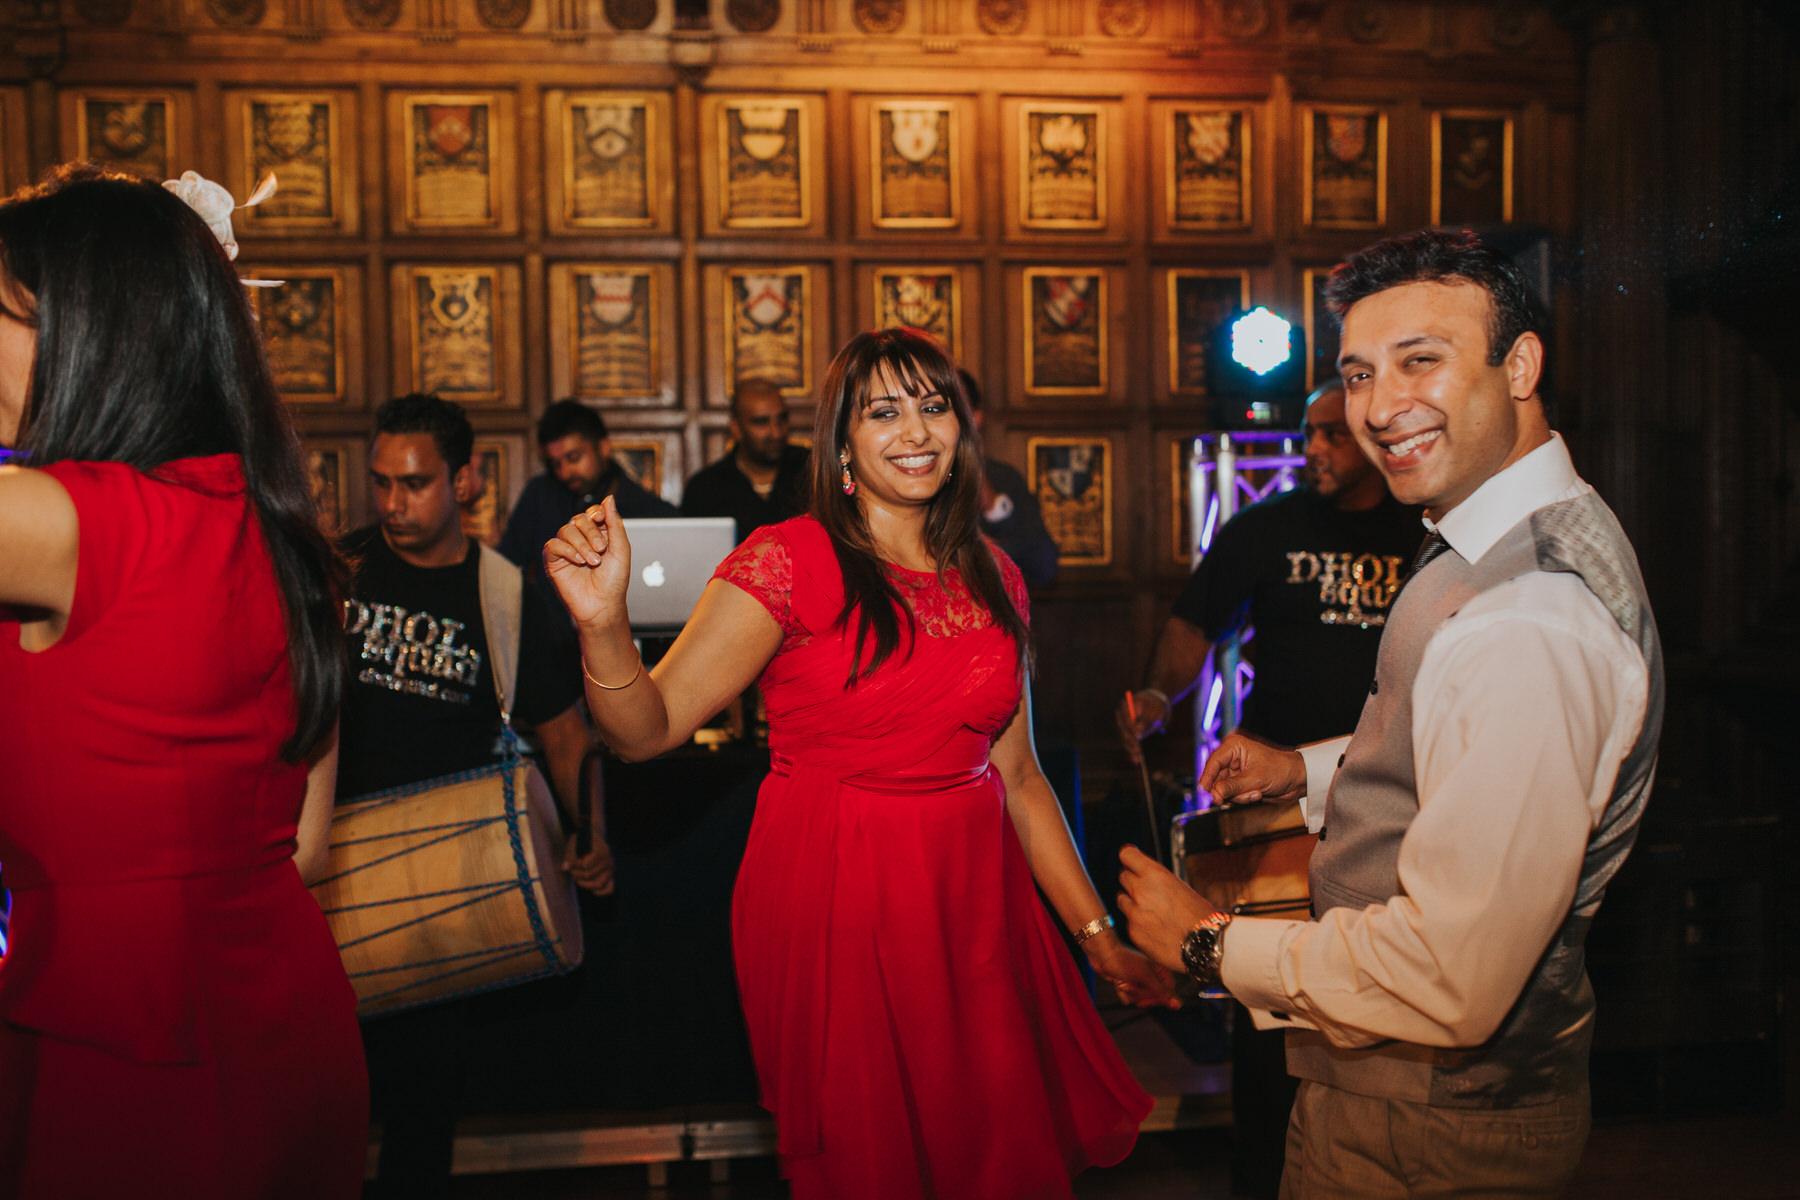 241-Anglo-Asian-London-Wedding-guests-dancing.jpg